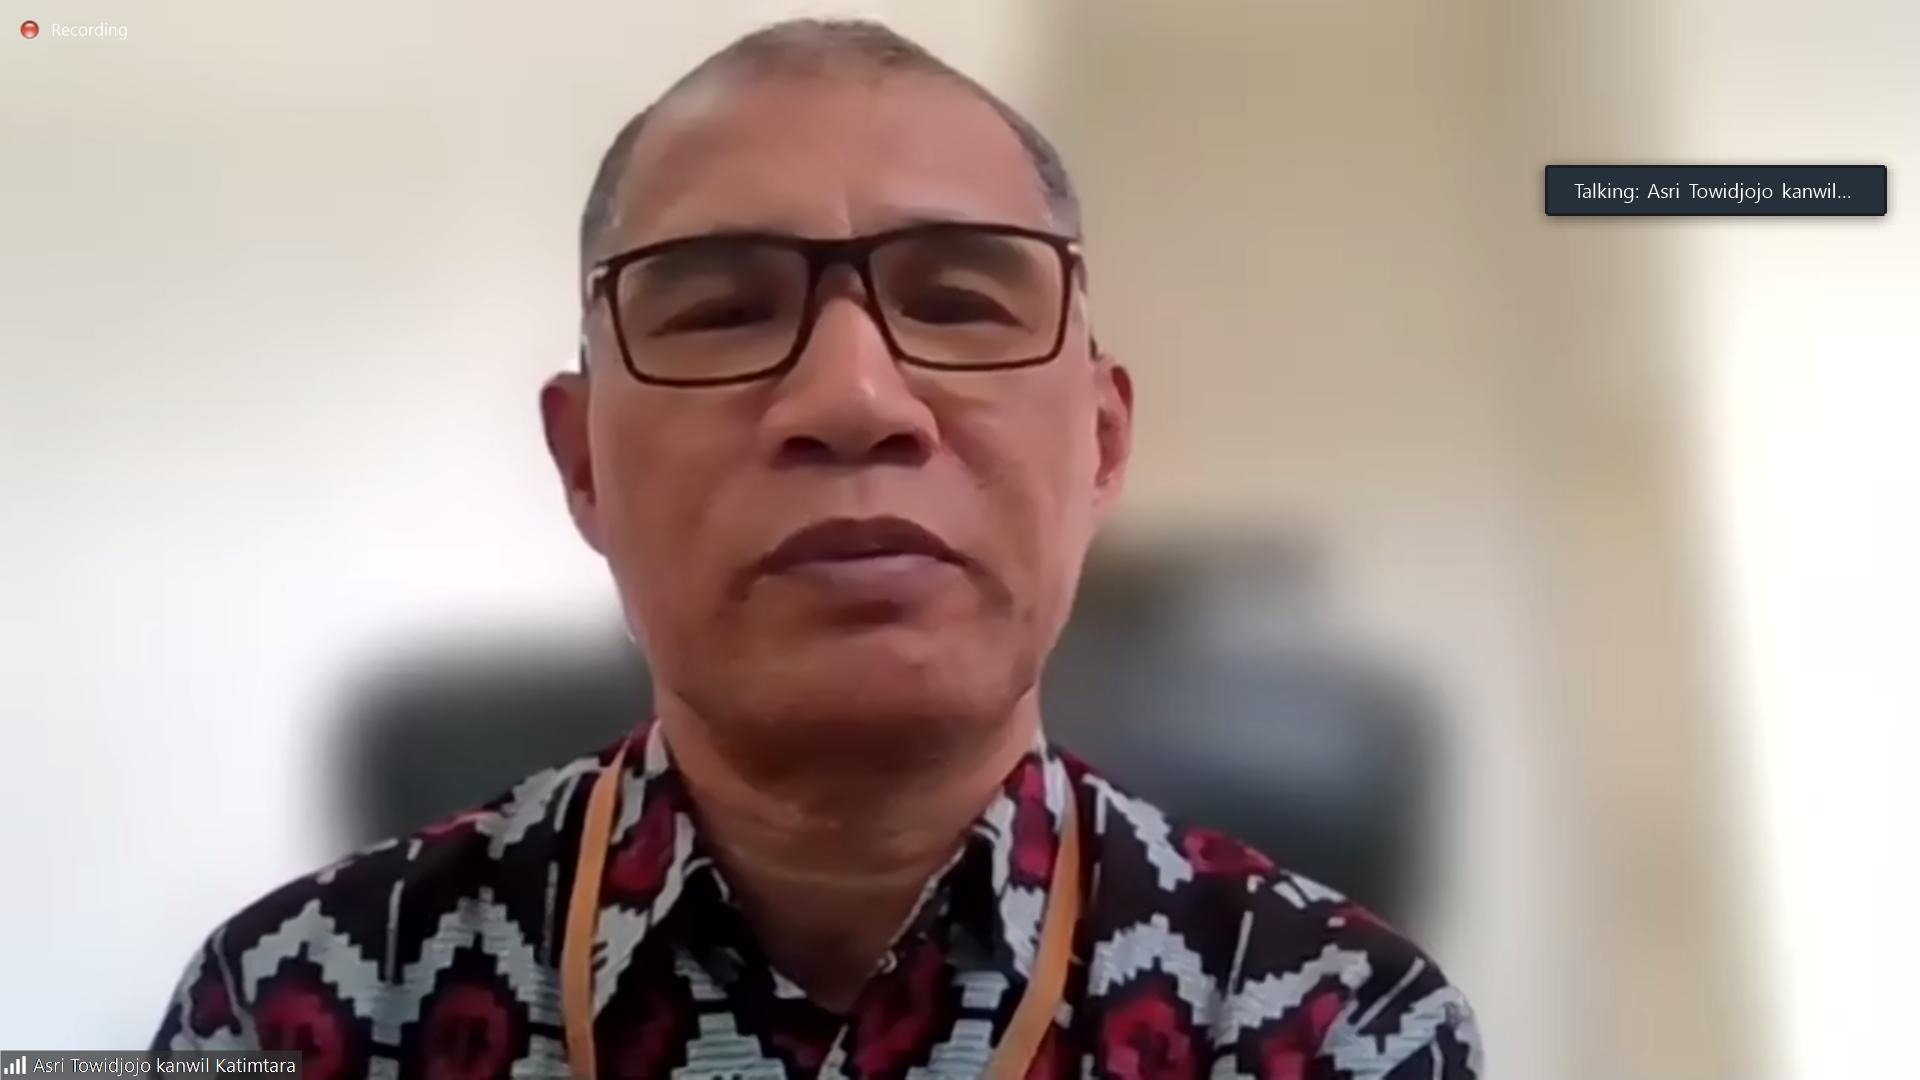 Rapat PUPN, Kusumawardhani: Mari Tindak Lanjuti Bersama demi Hasil yang Optimal